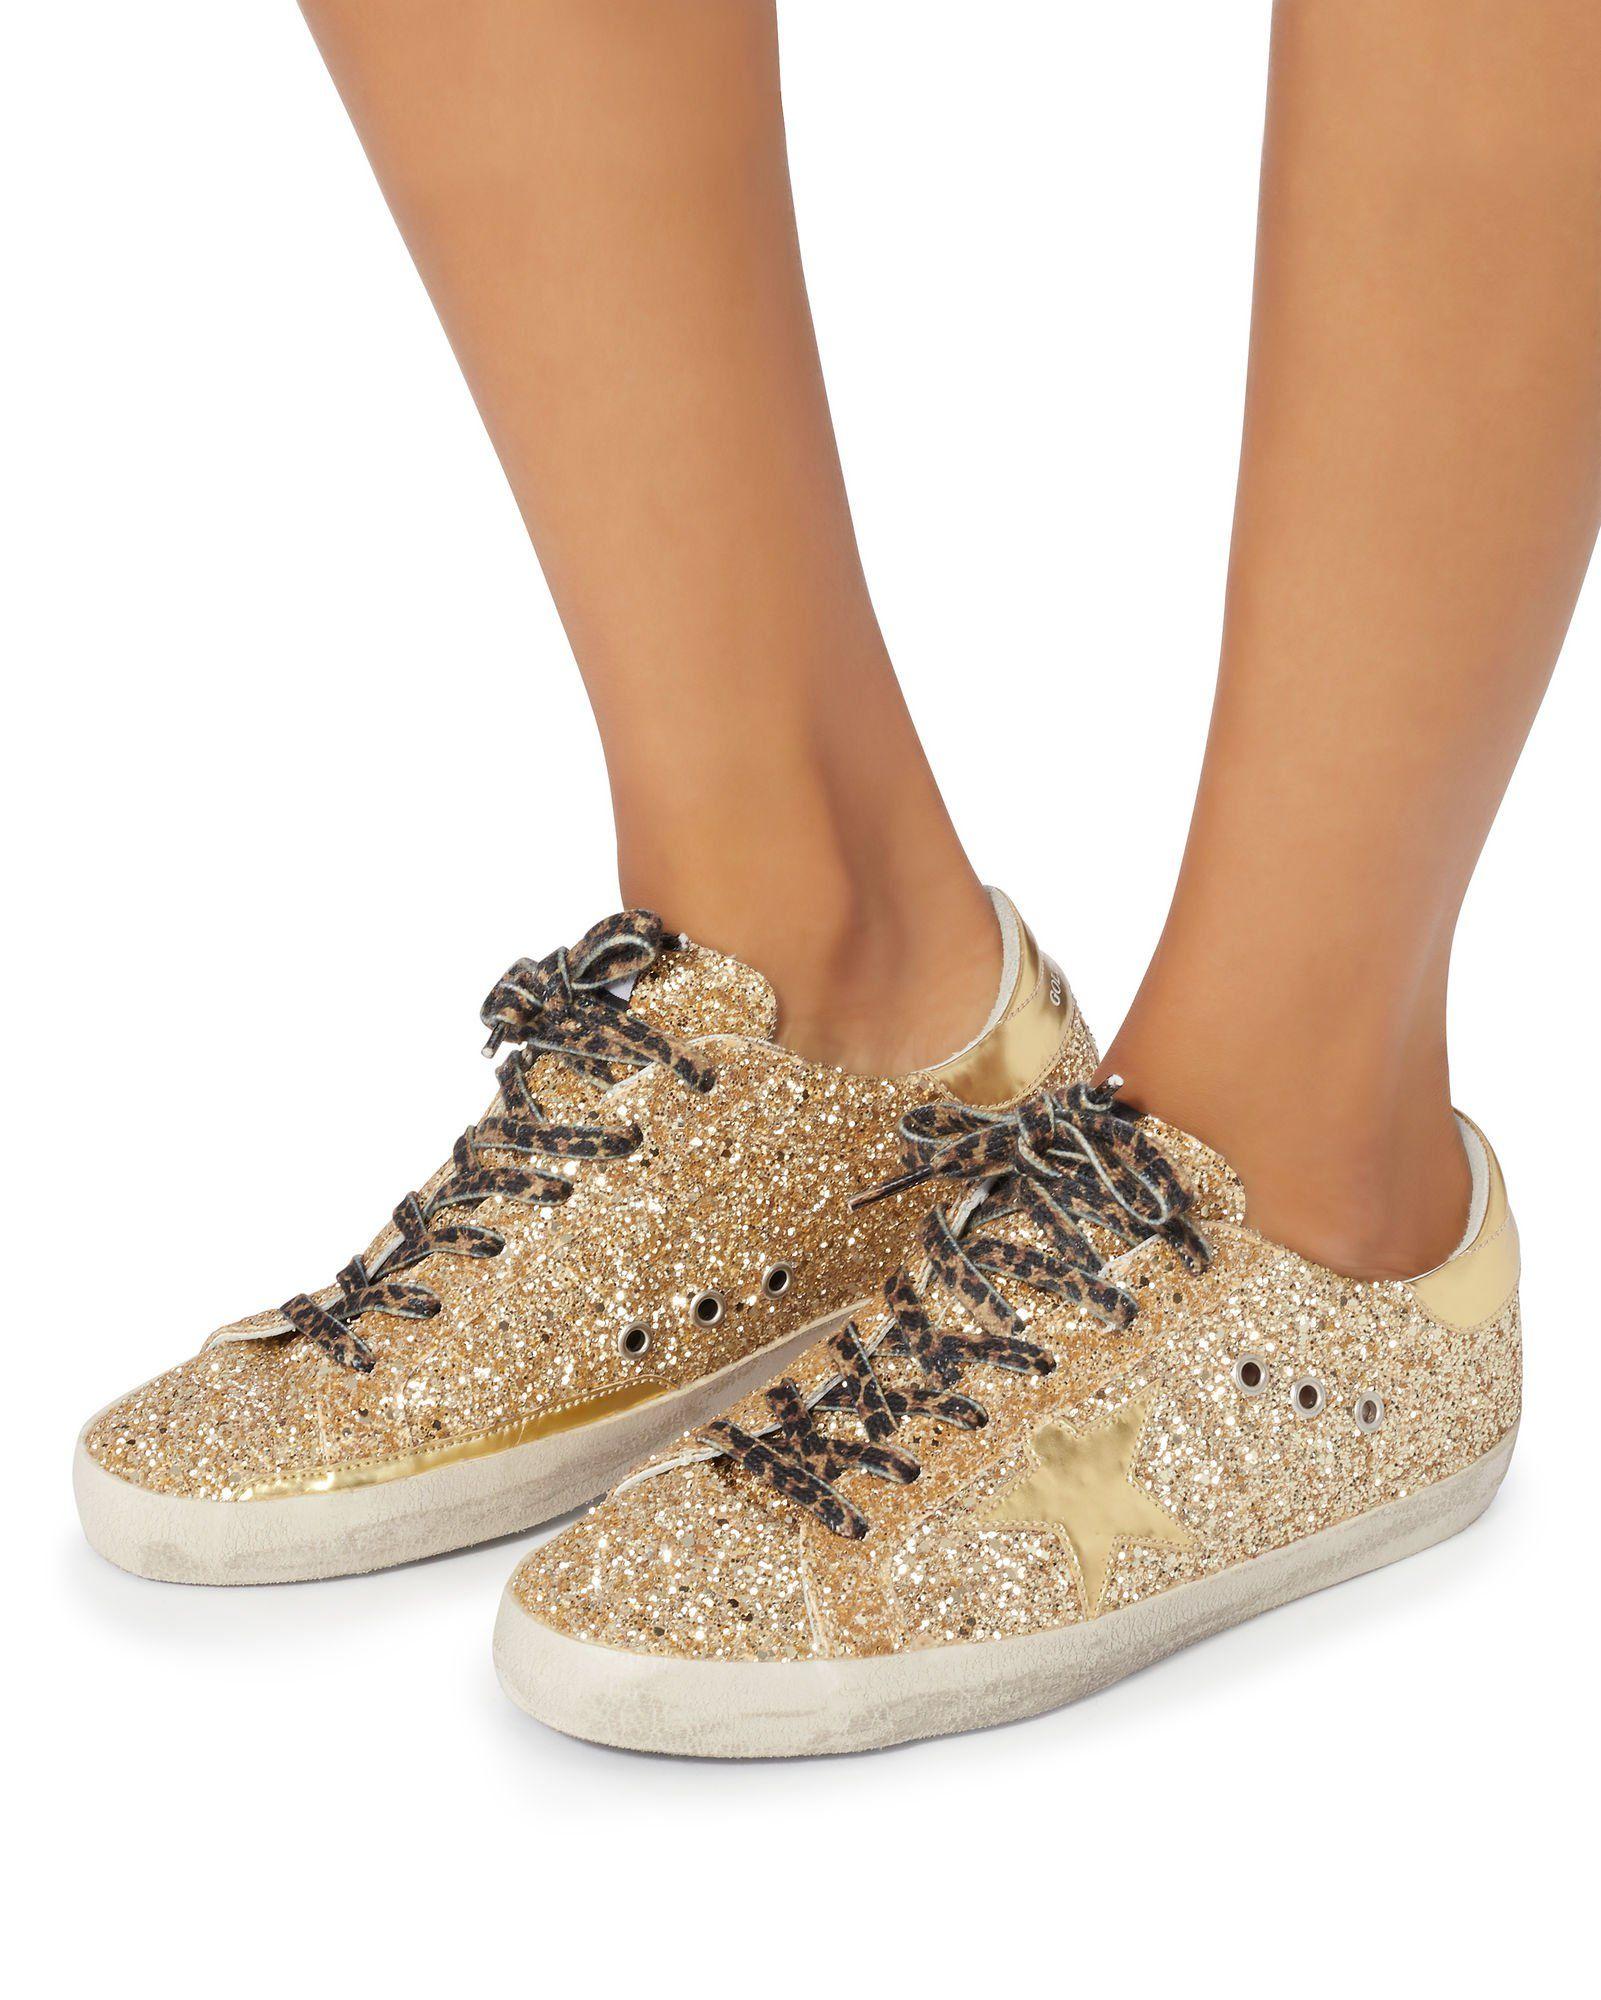 Superstar Leopard Lace Gold Glitter Sneakers Glitter Sneakers Sneakers Fashion Sneakers